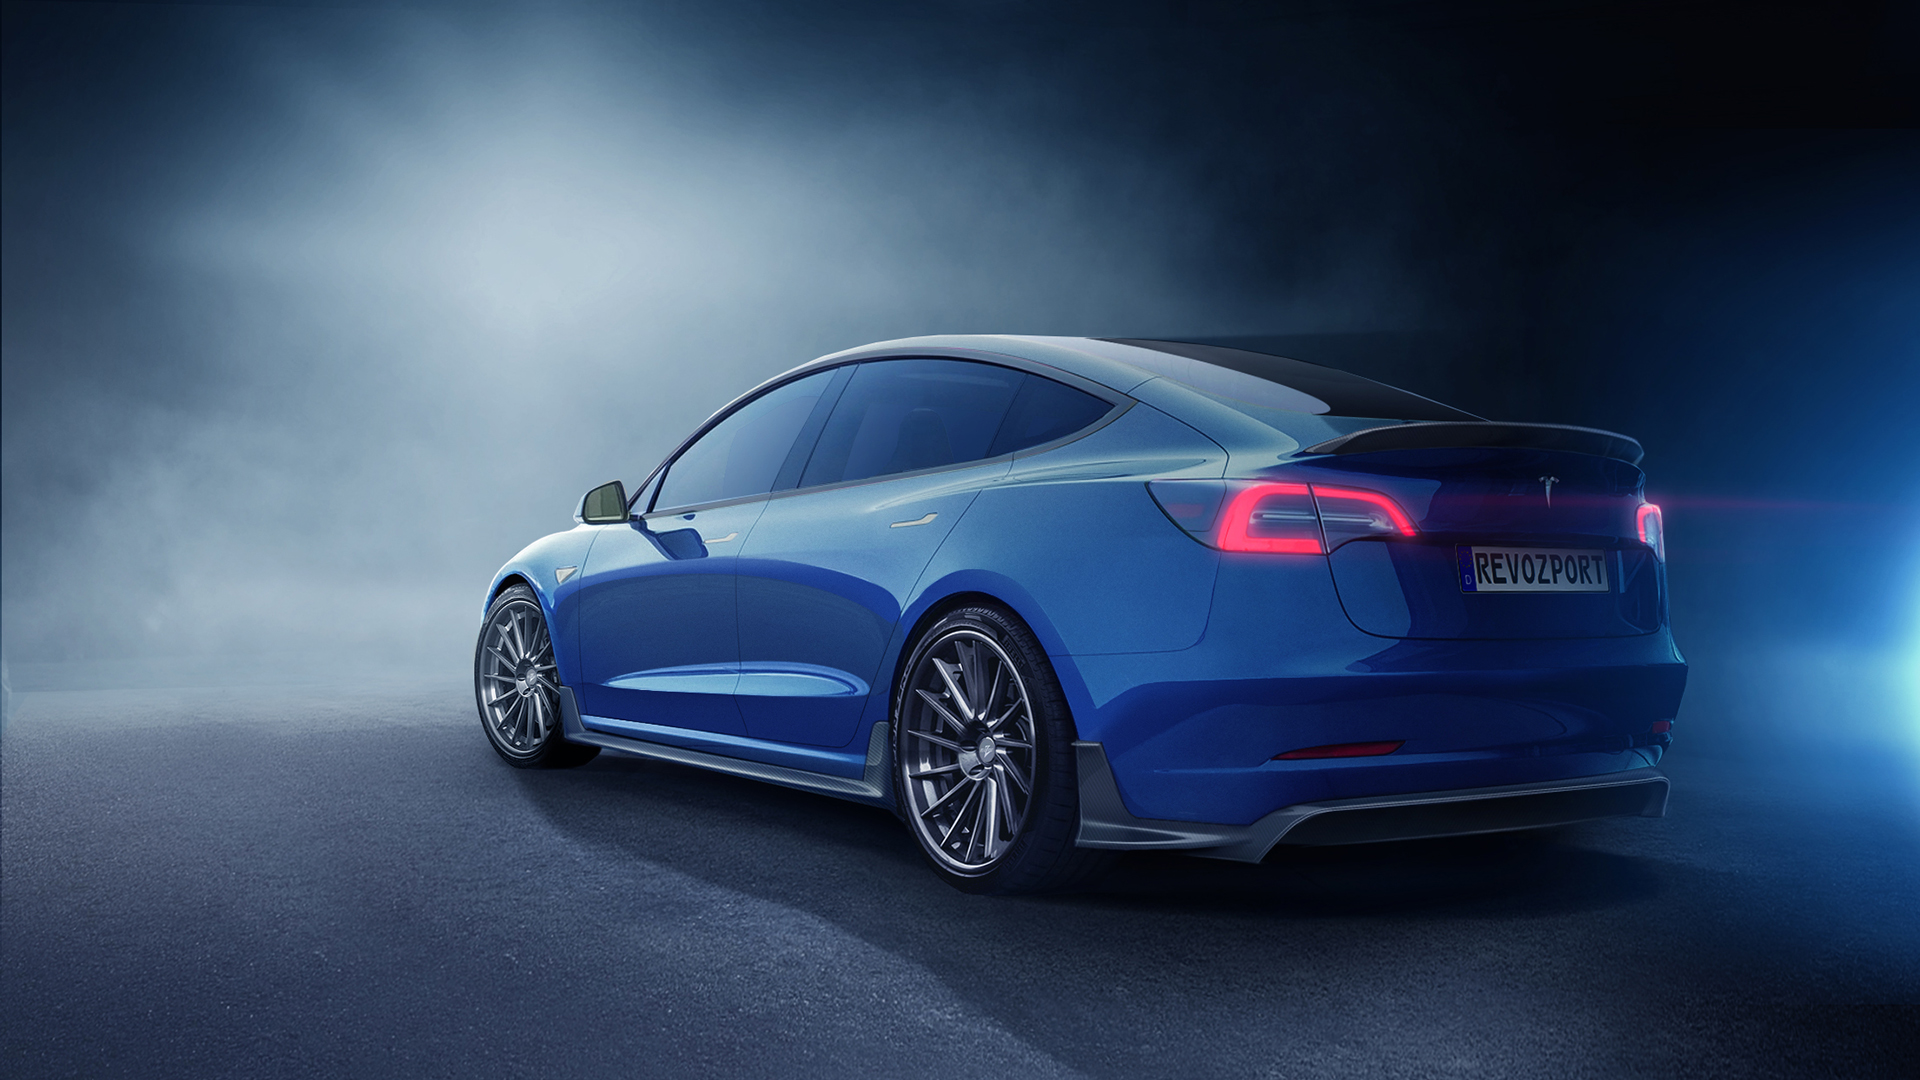 RevoZport Offers Two Body Kits For Tesla's Model 3